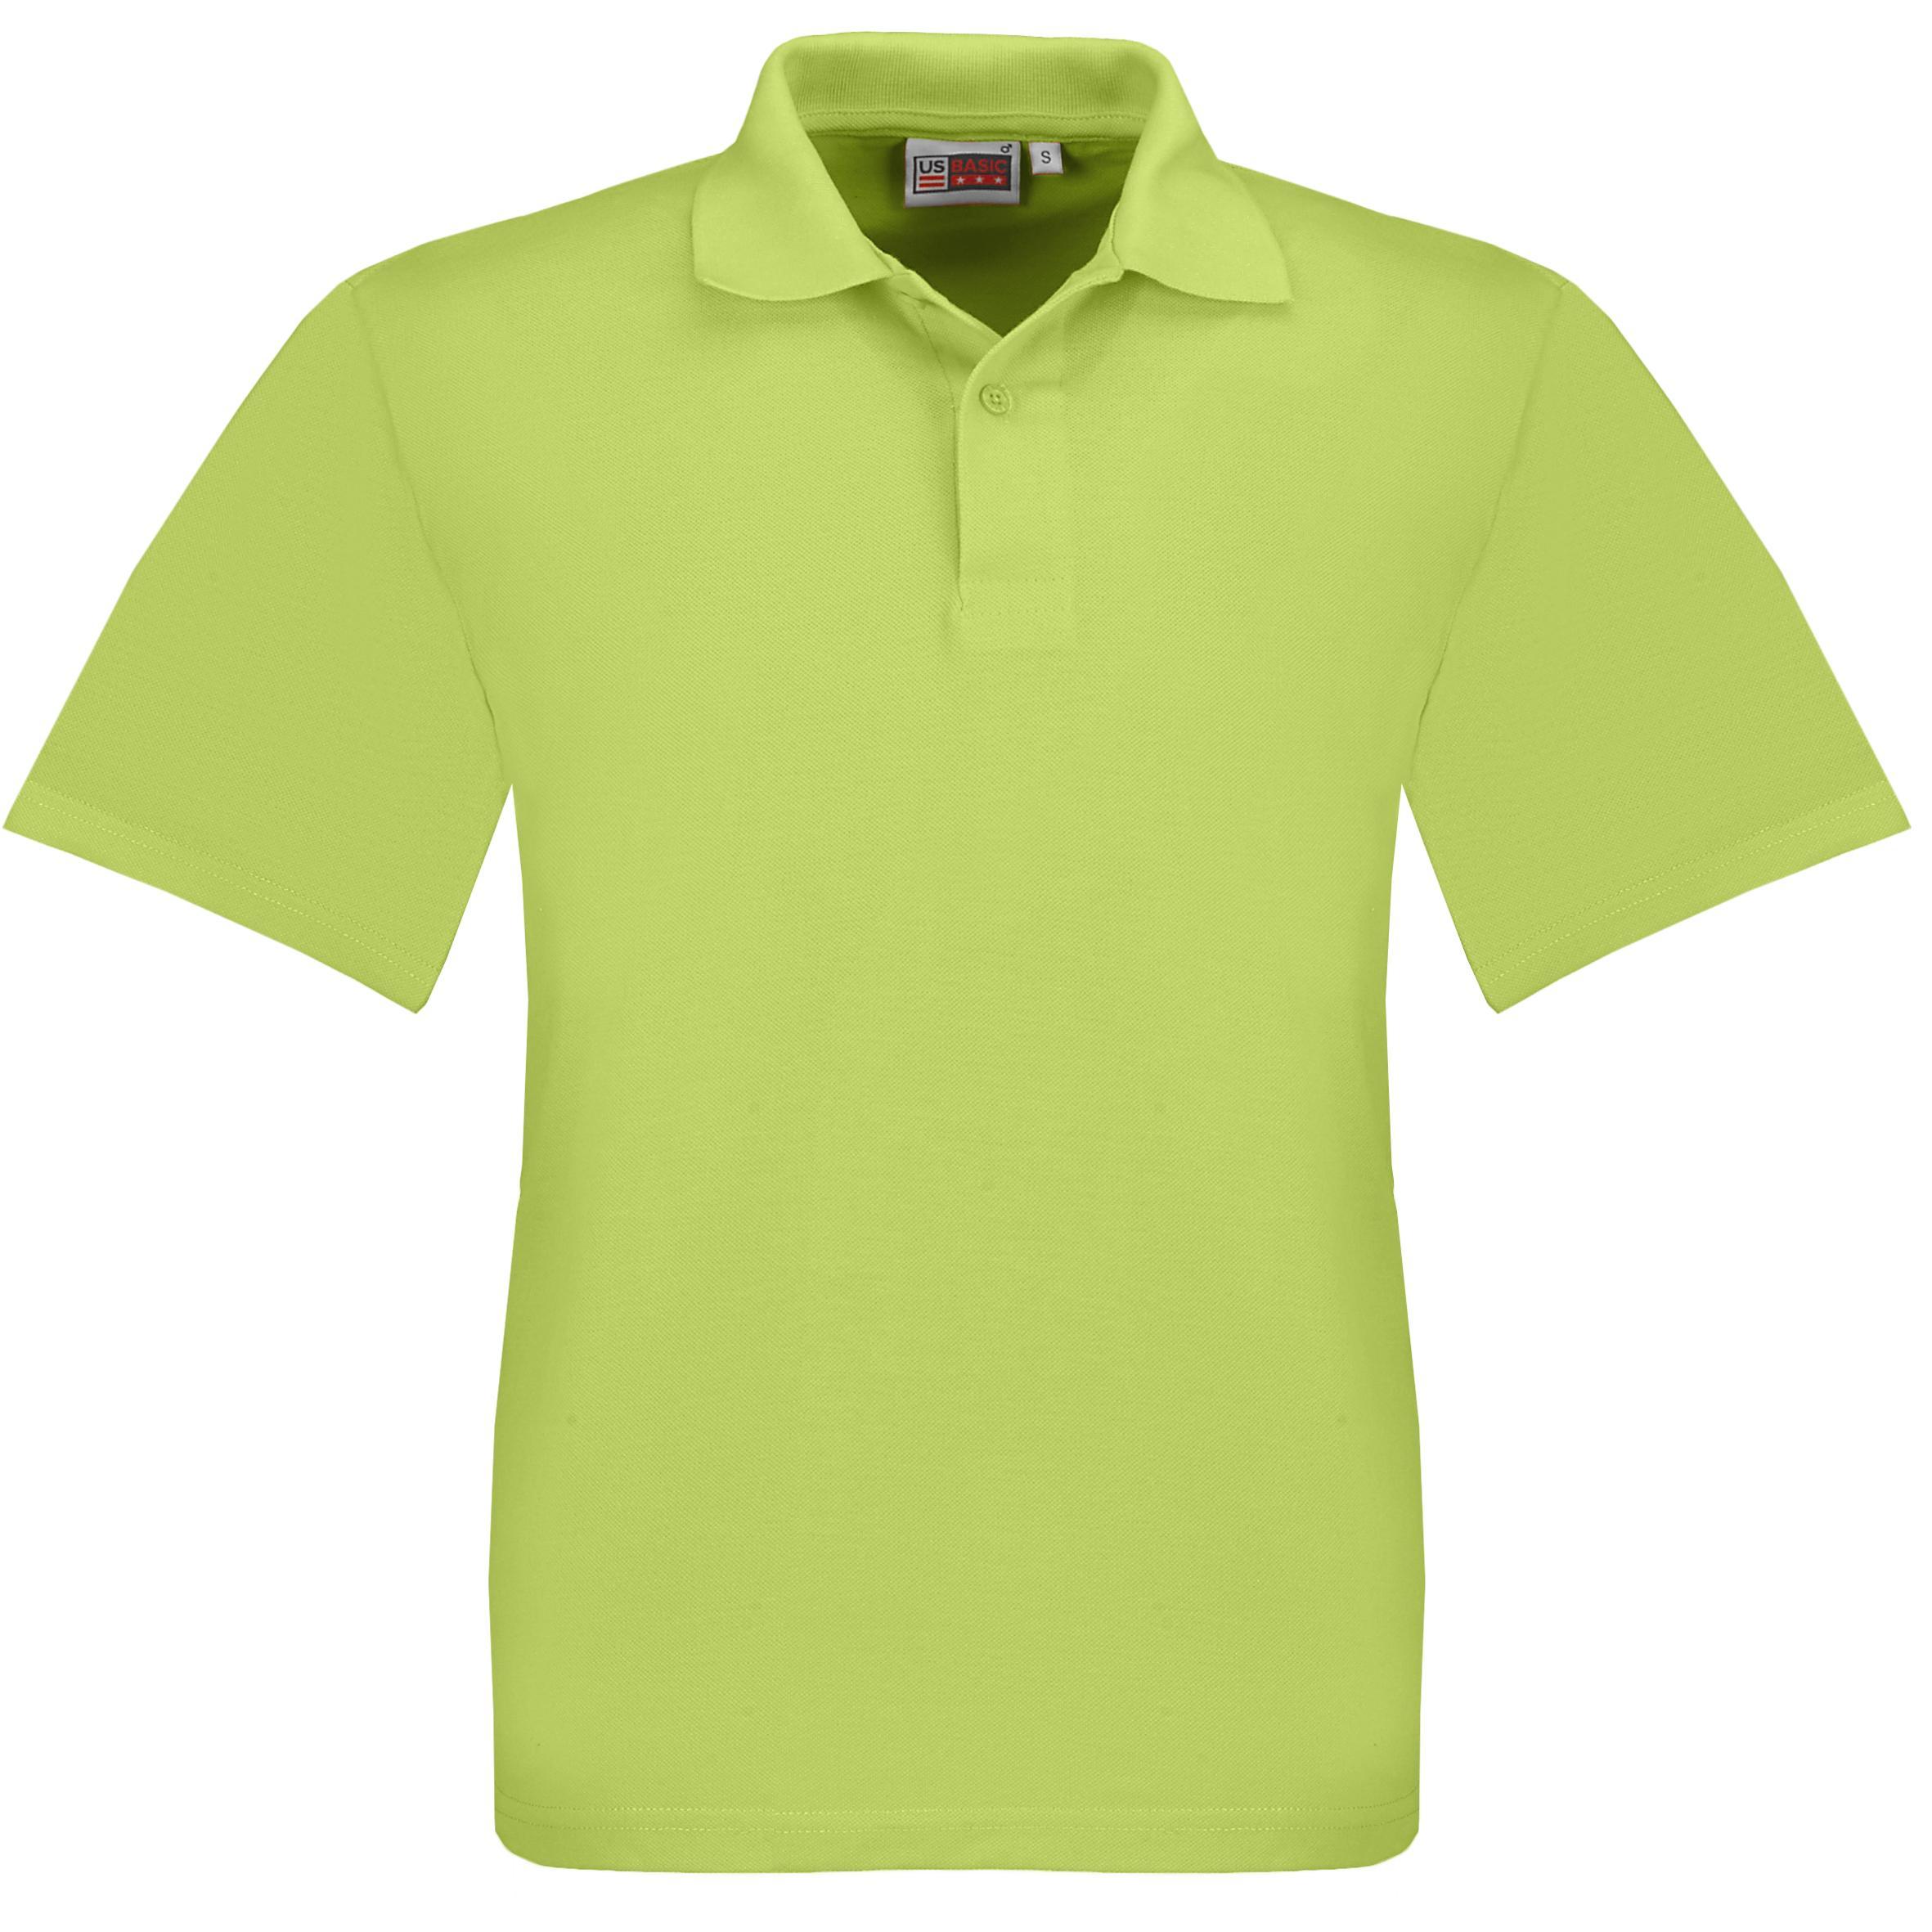 Kids Elemental Golf Shirt - Lime Only